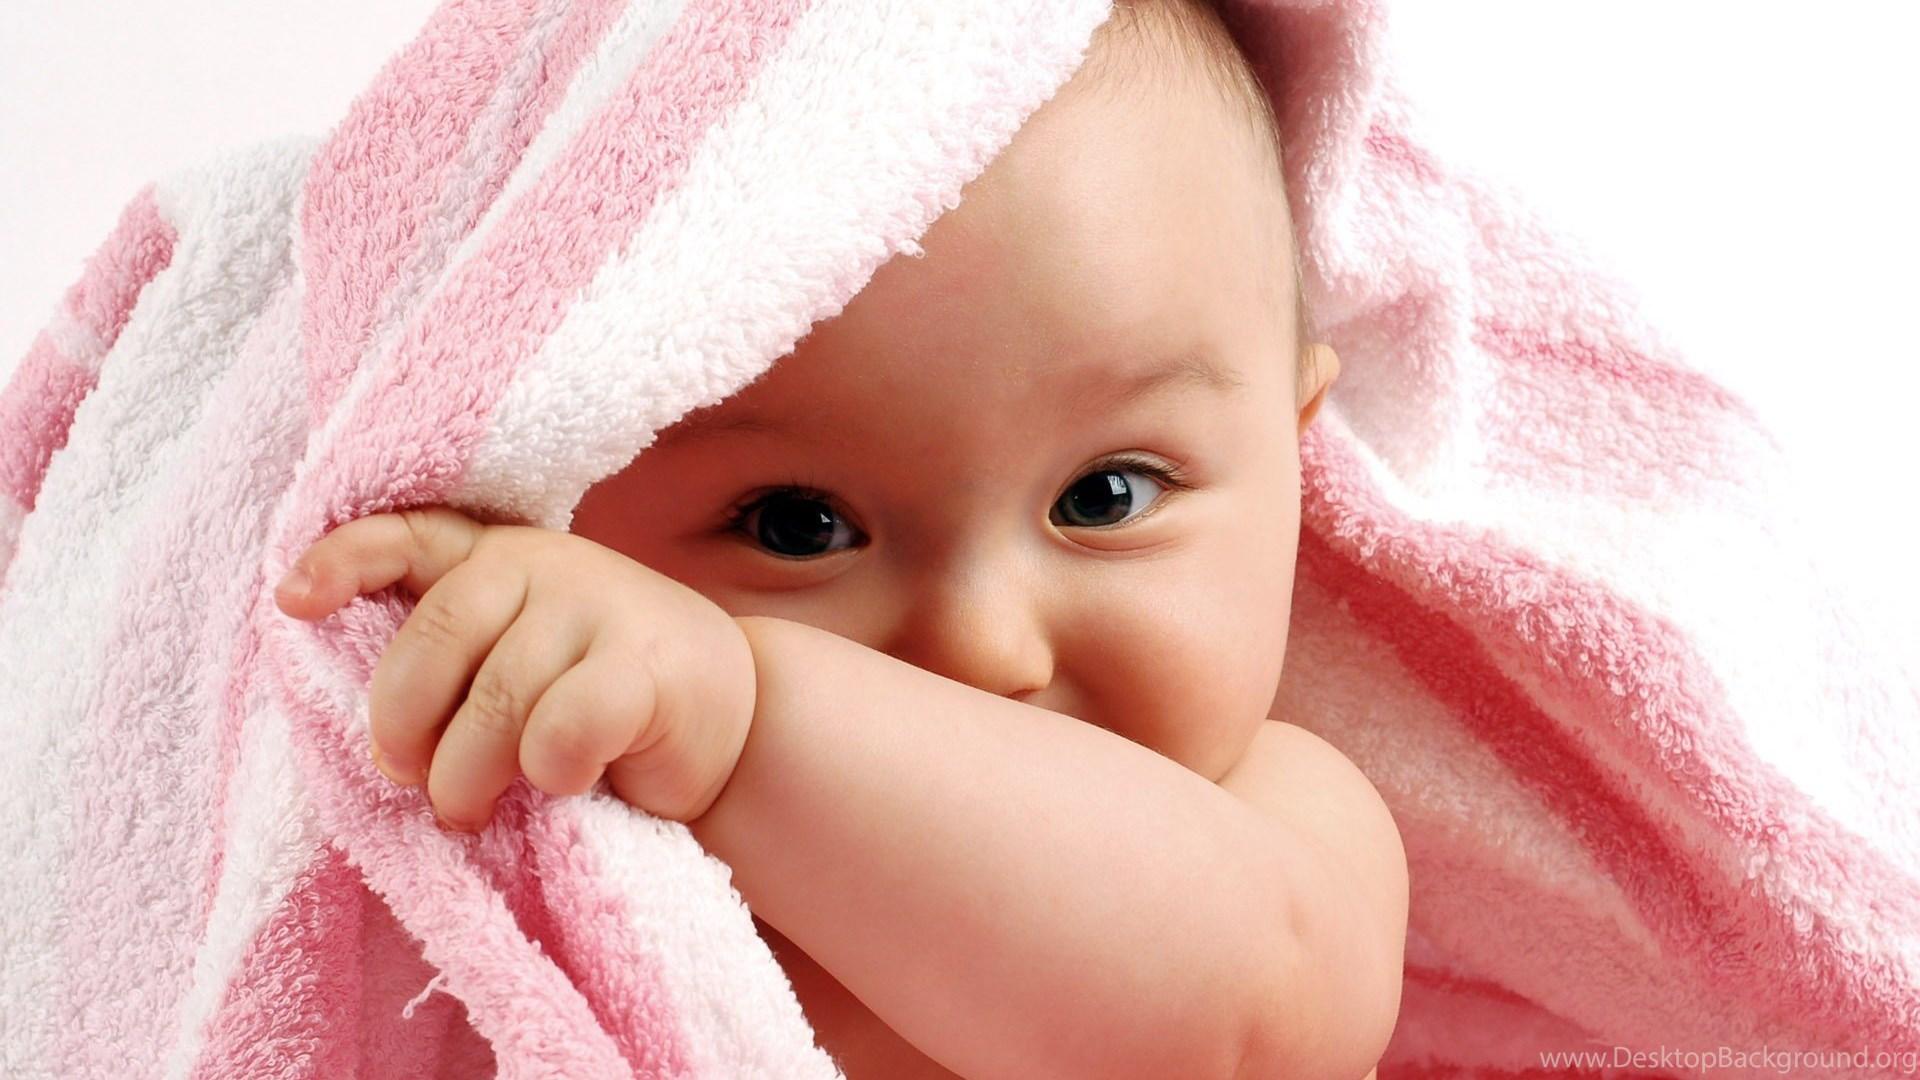 Beautiful Cute Baby Boy Girls Hd Wallpapers Photos Free Desktop Background